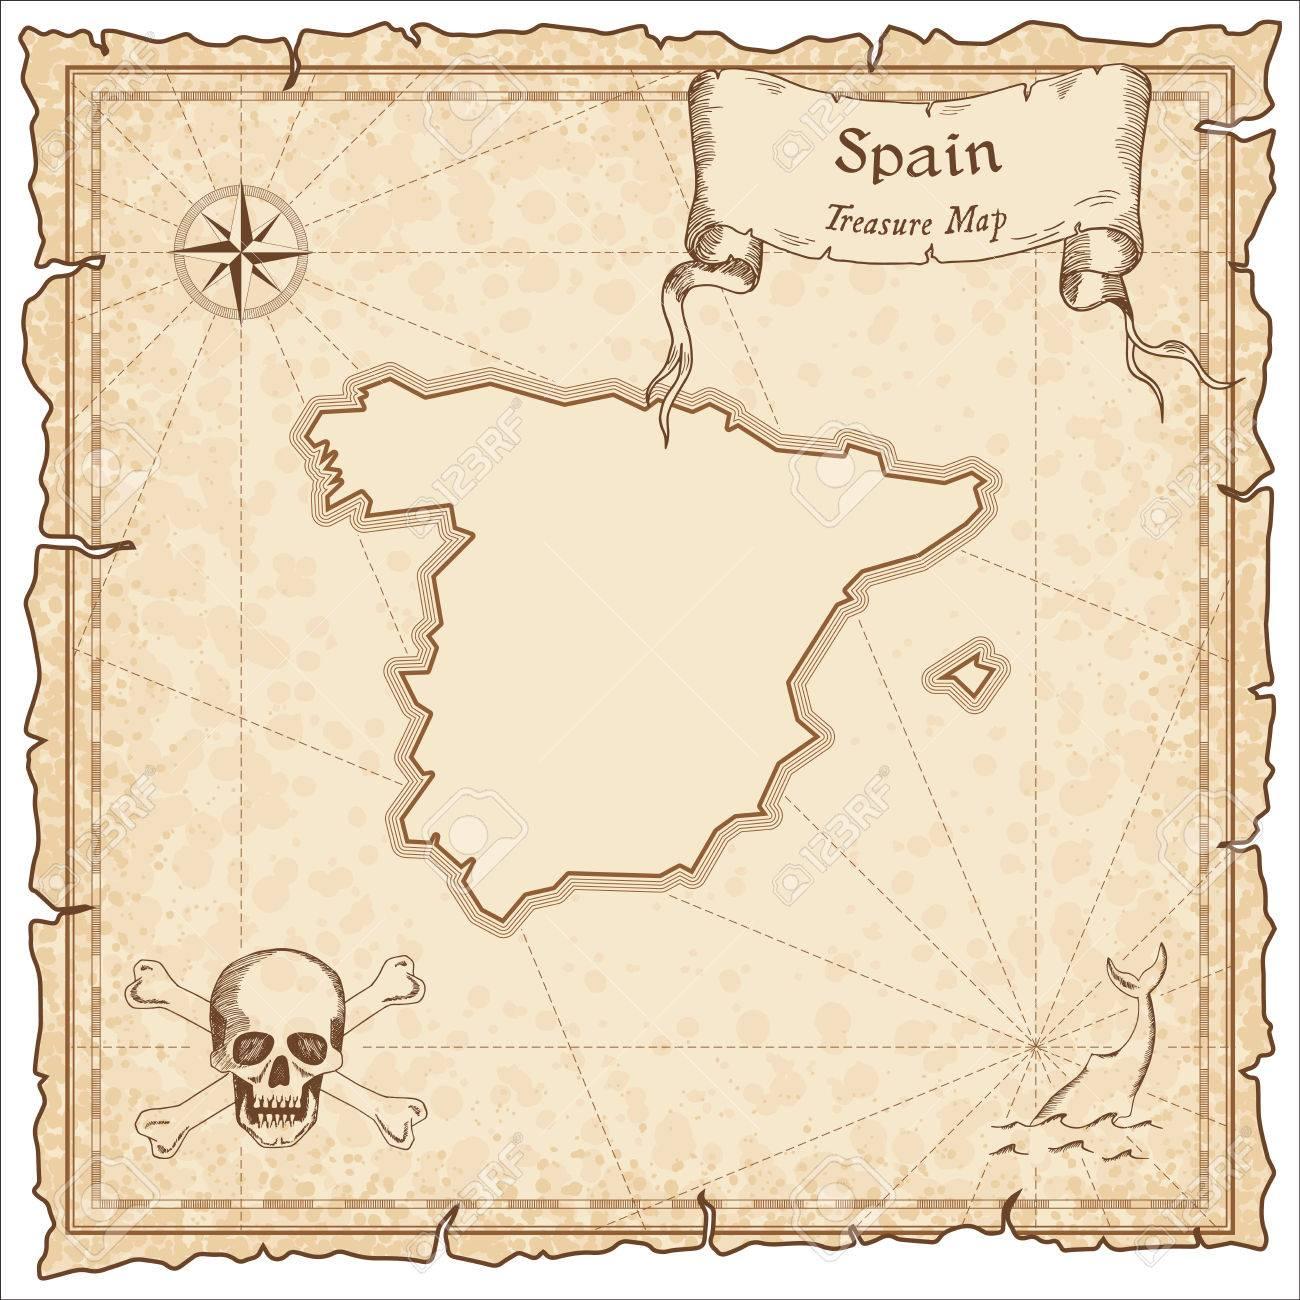 España Antiguo Mapa De Piratas. Sepia Plantilla Grabada De Mapa Del ...